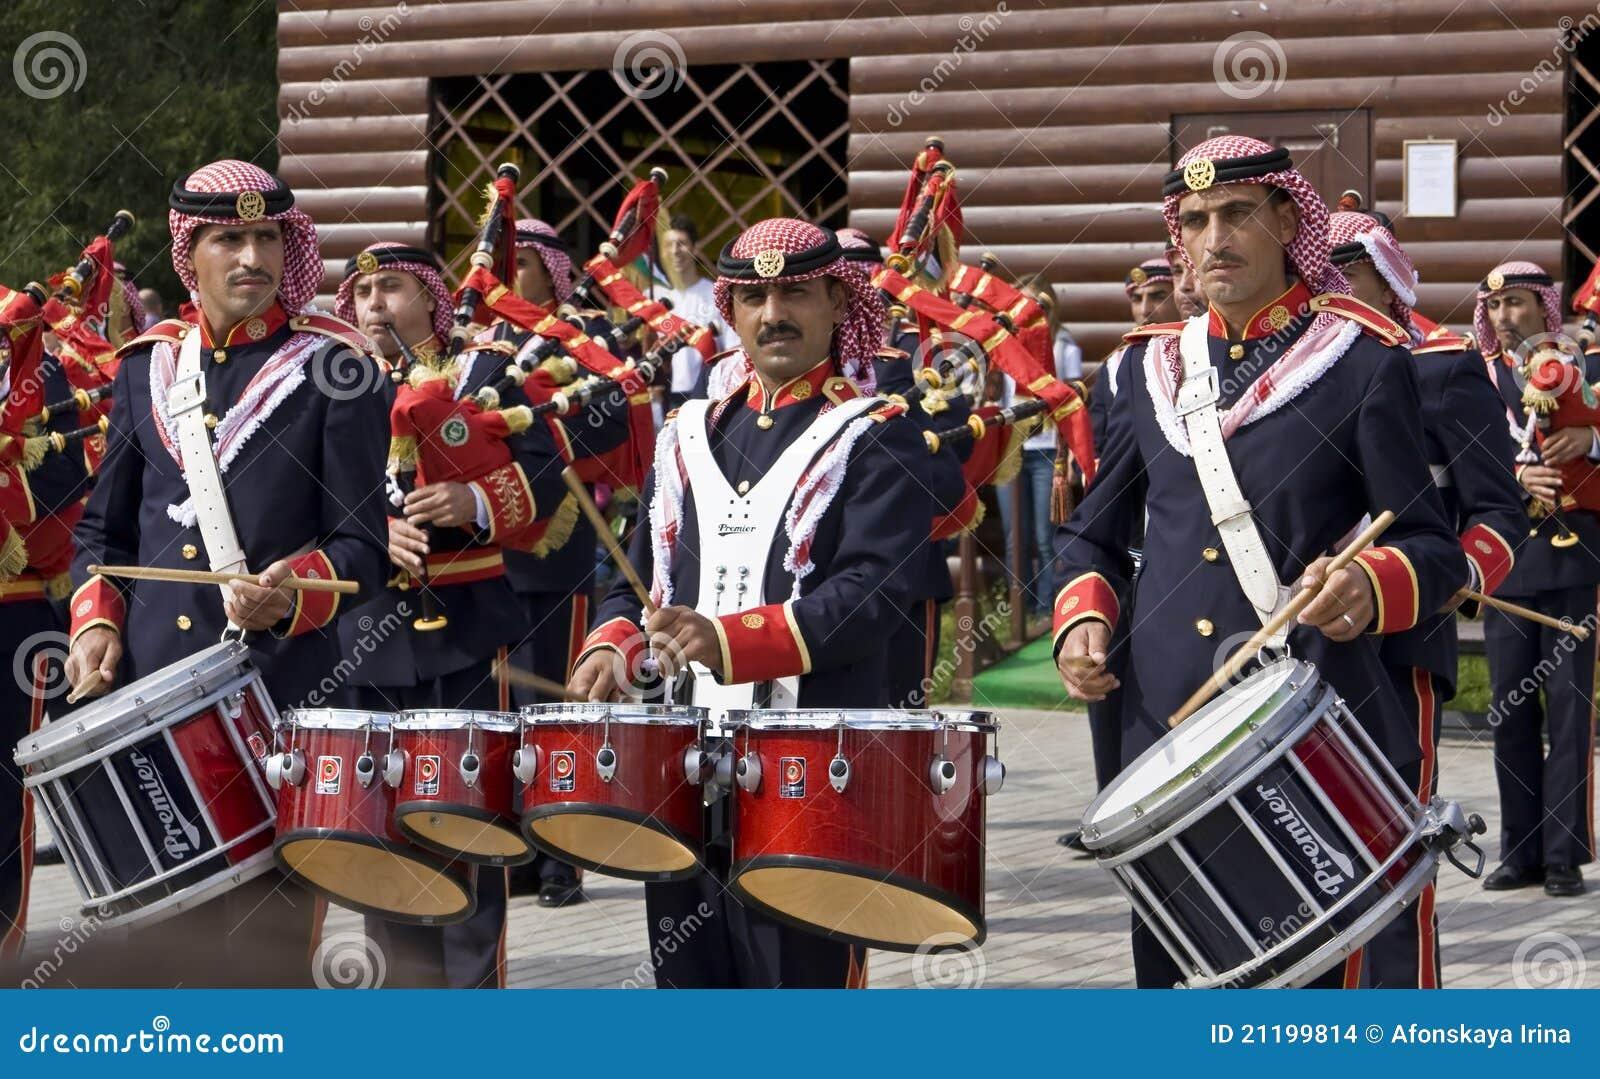 Jordanian military orchestra, festival